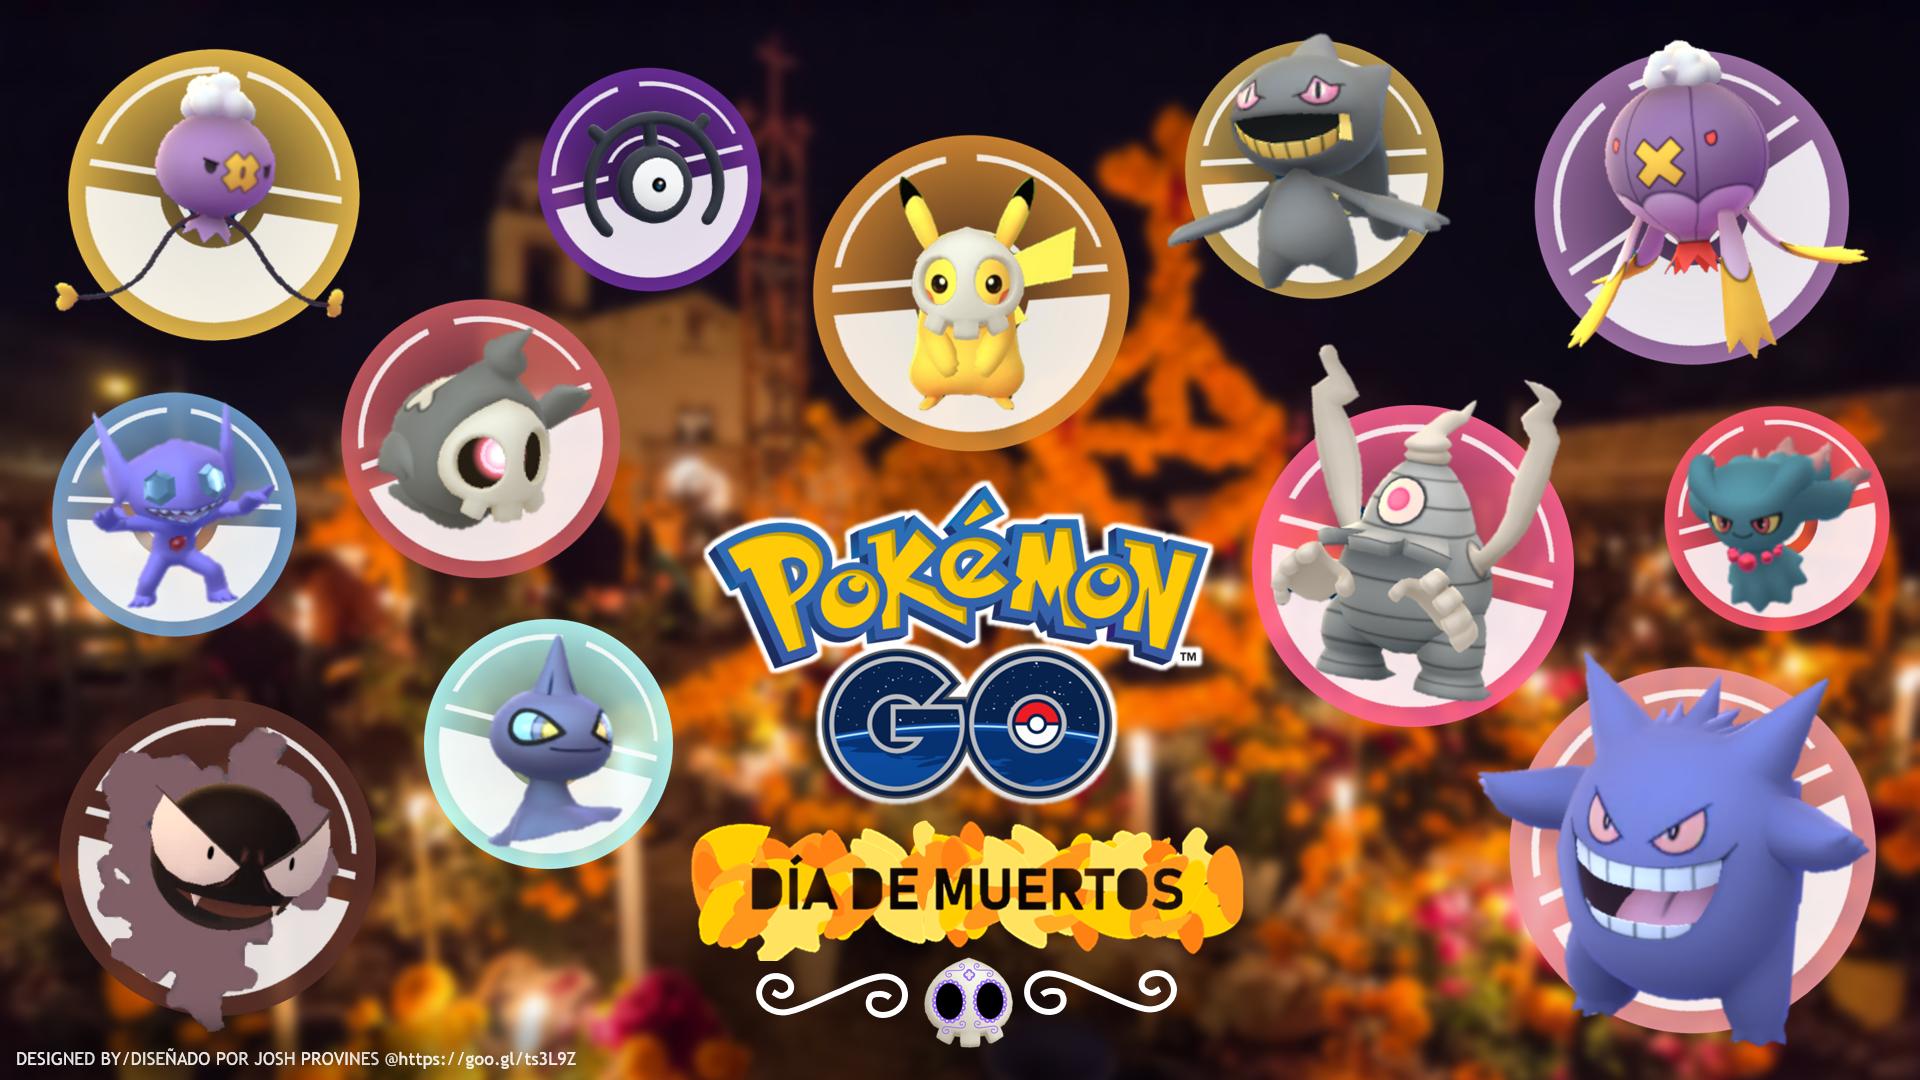 Conceptual Event Día De Muertos Pokémon Go Hub